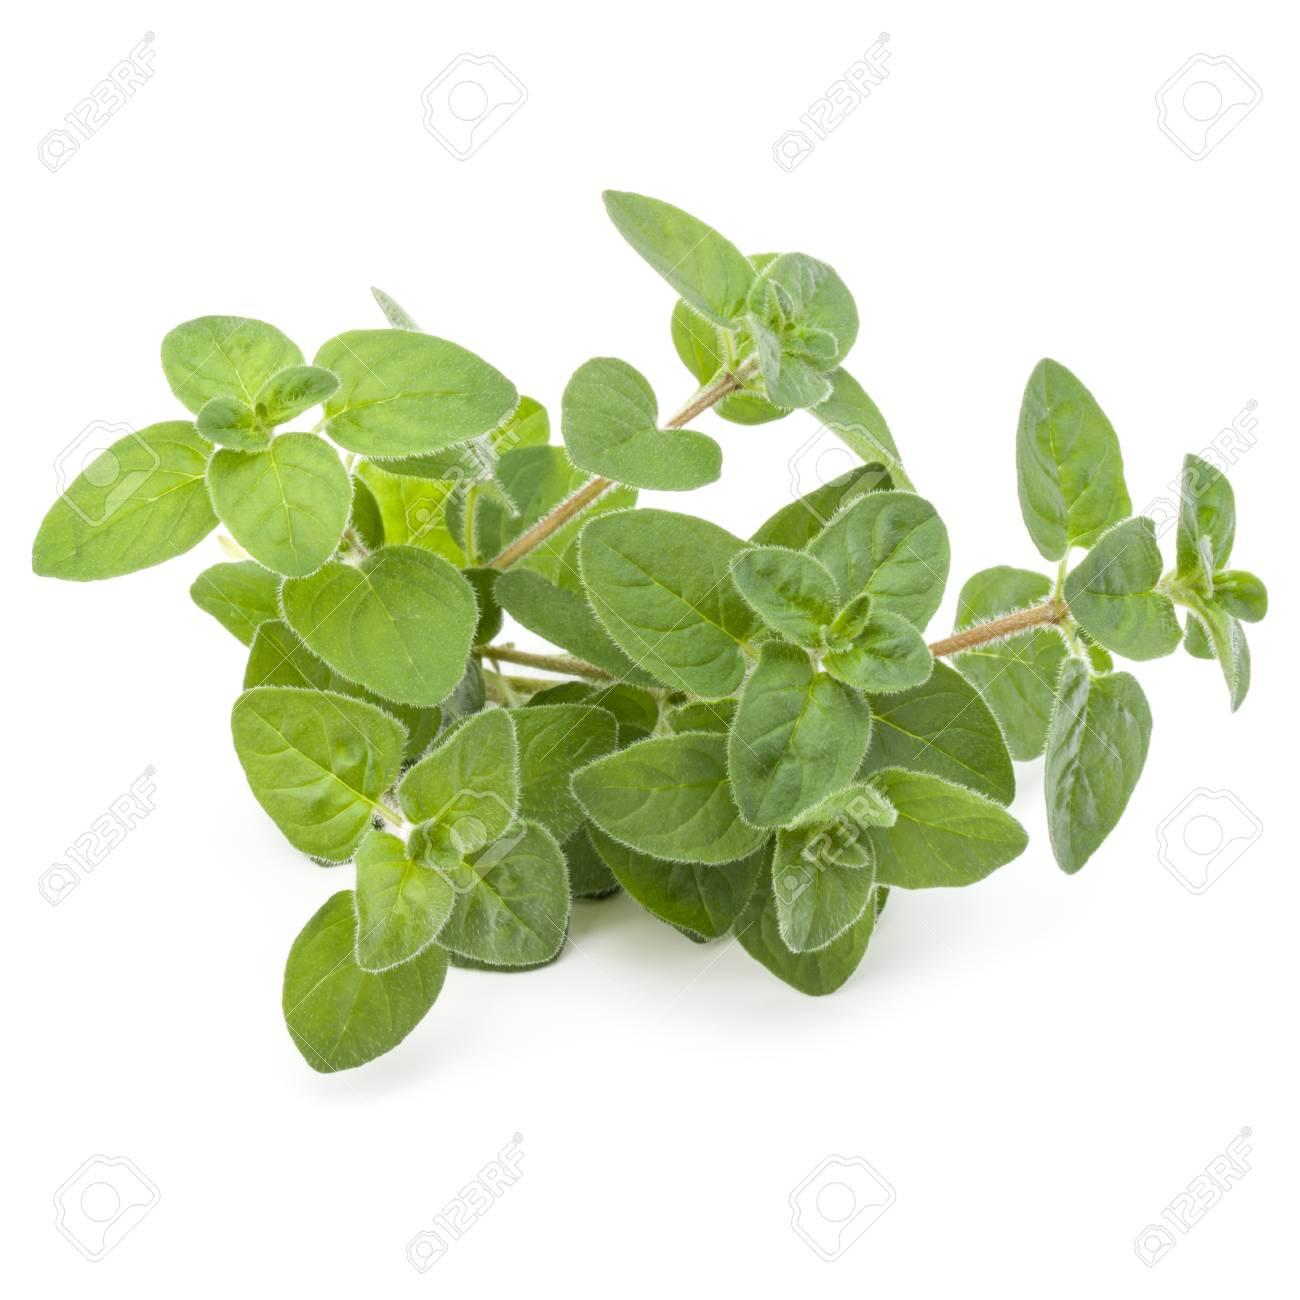 Oregano or marjoram leaves isolated on white background cutout - 88716776